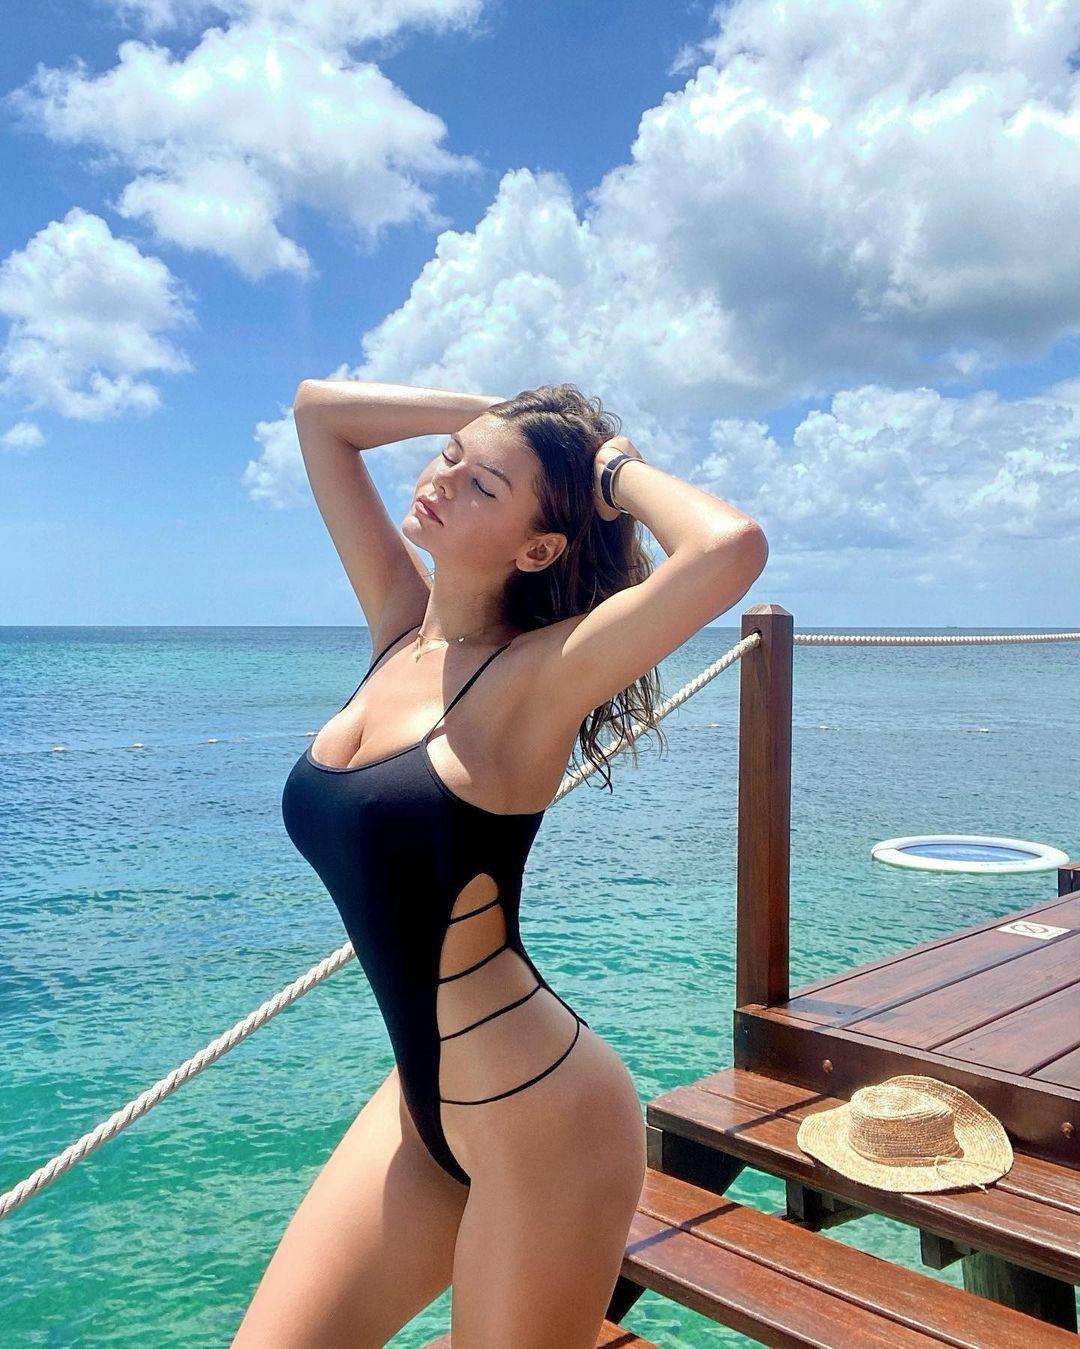 Ashley Tervort In Swimsuit